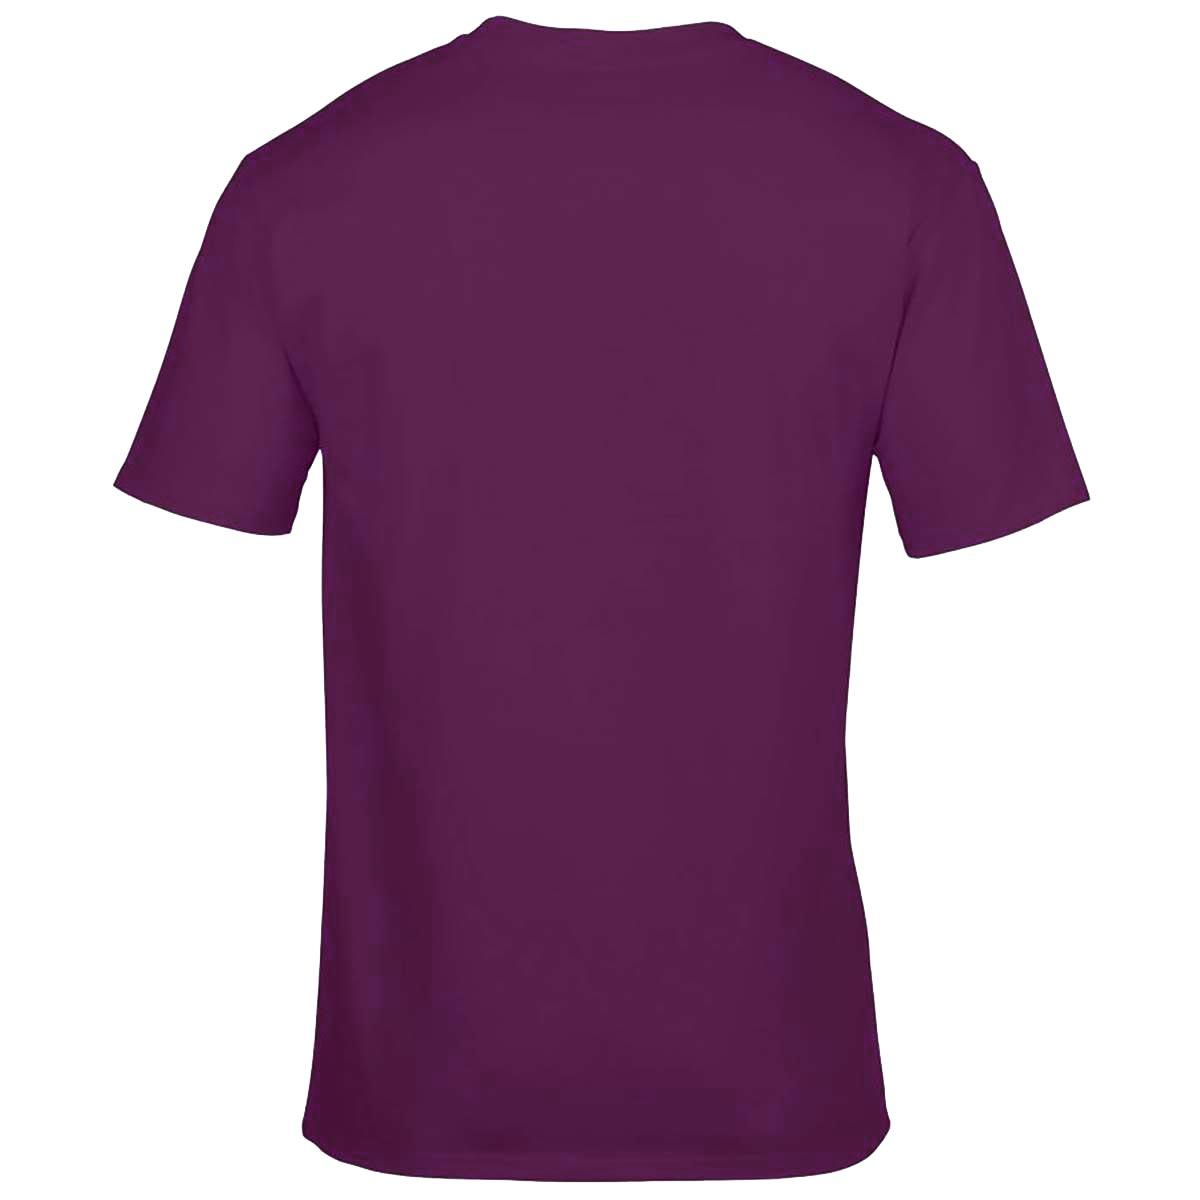 05_gd05b_violet--0-0--eed76a69-cfce-4492-a4ae-67a11a53770c